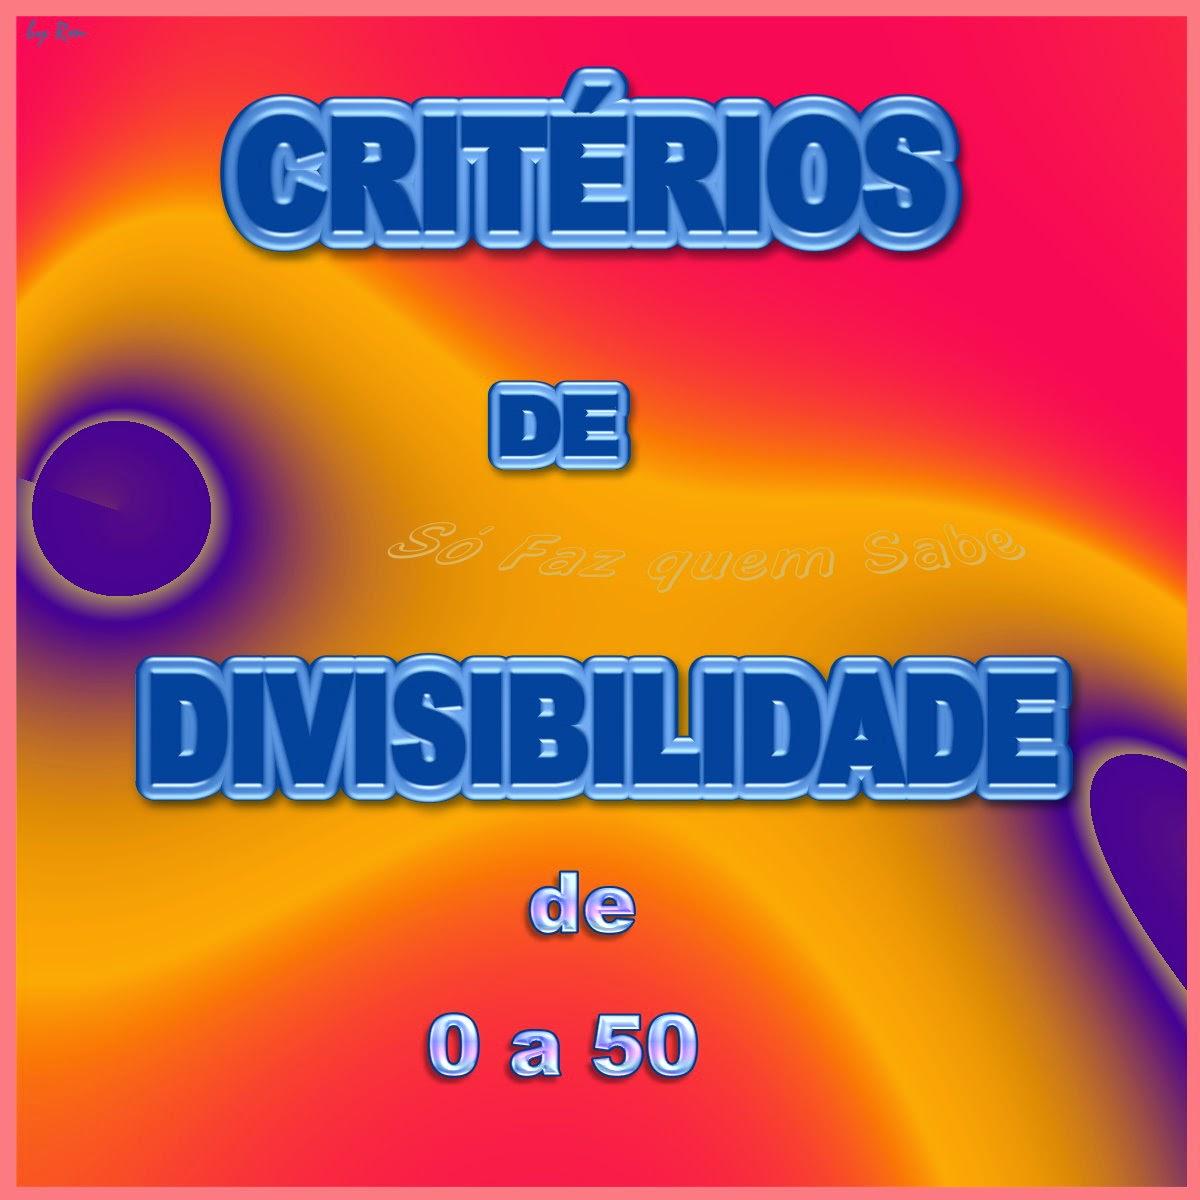 Critérios ou Regras de Divisibilidade - divisíveis por números de 0 a 50